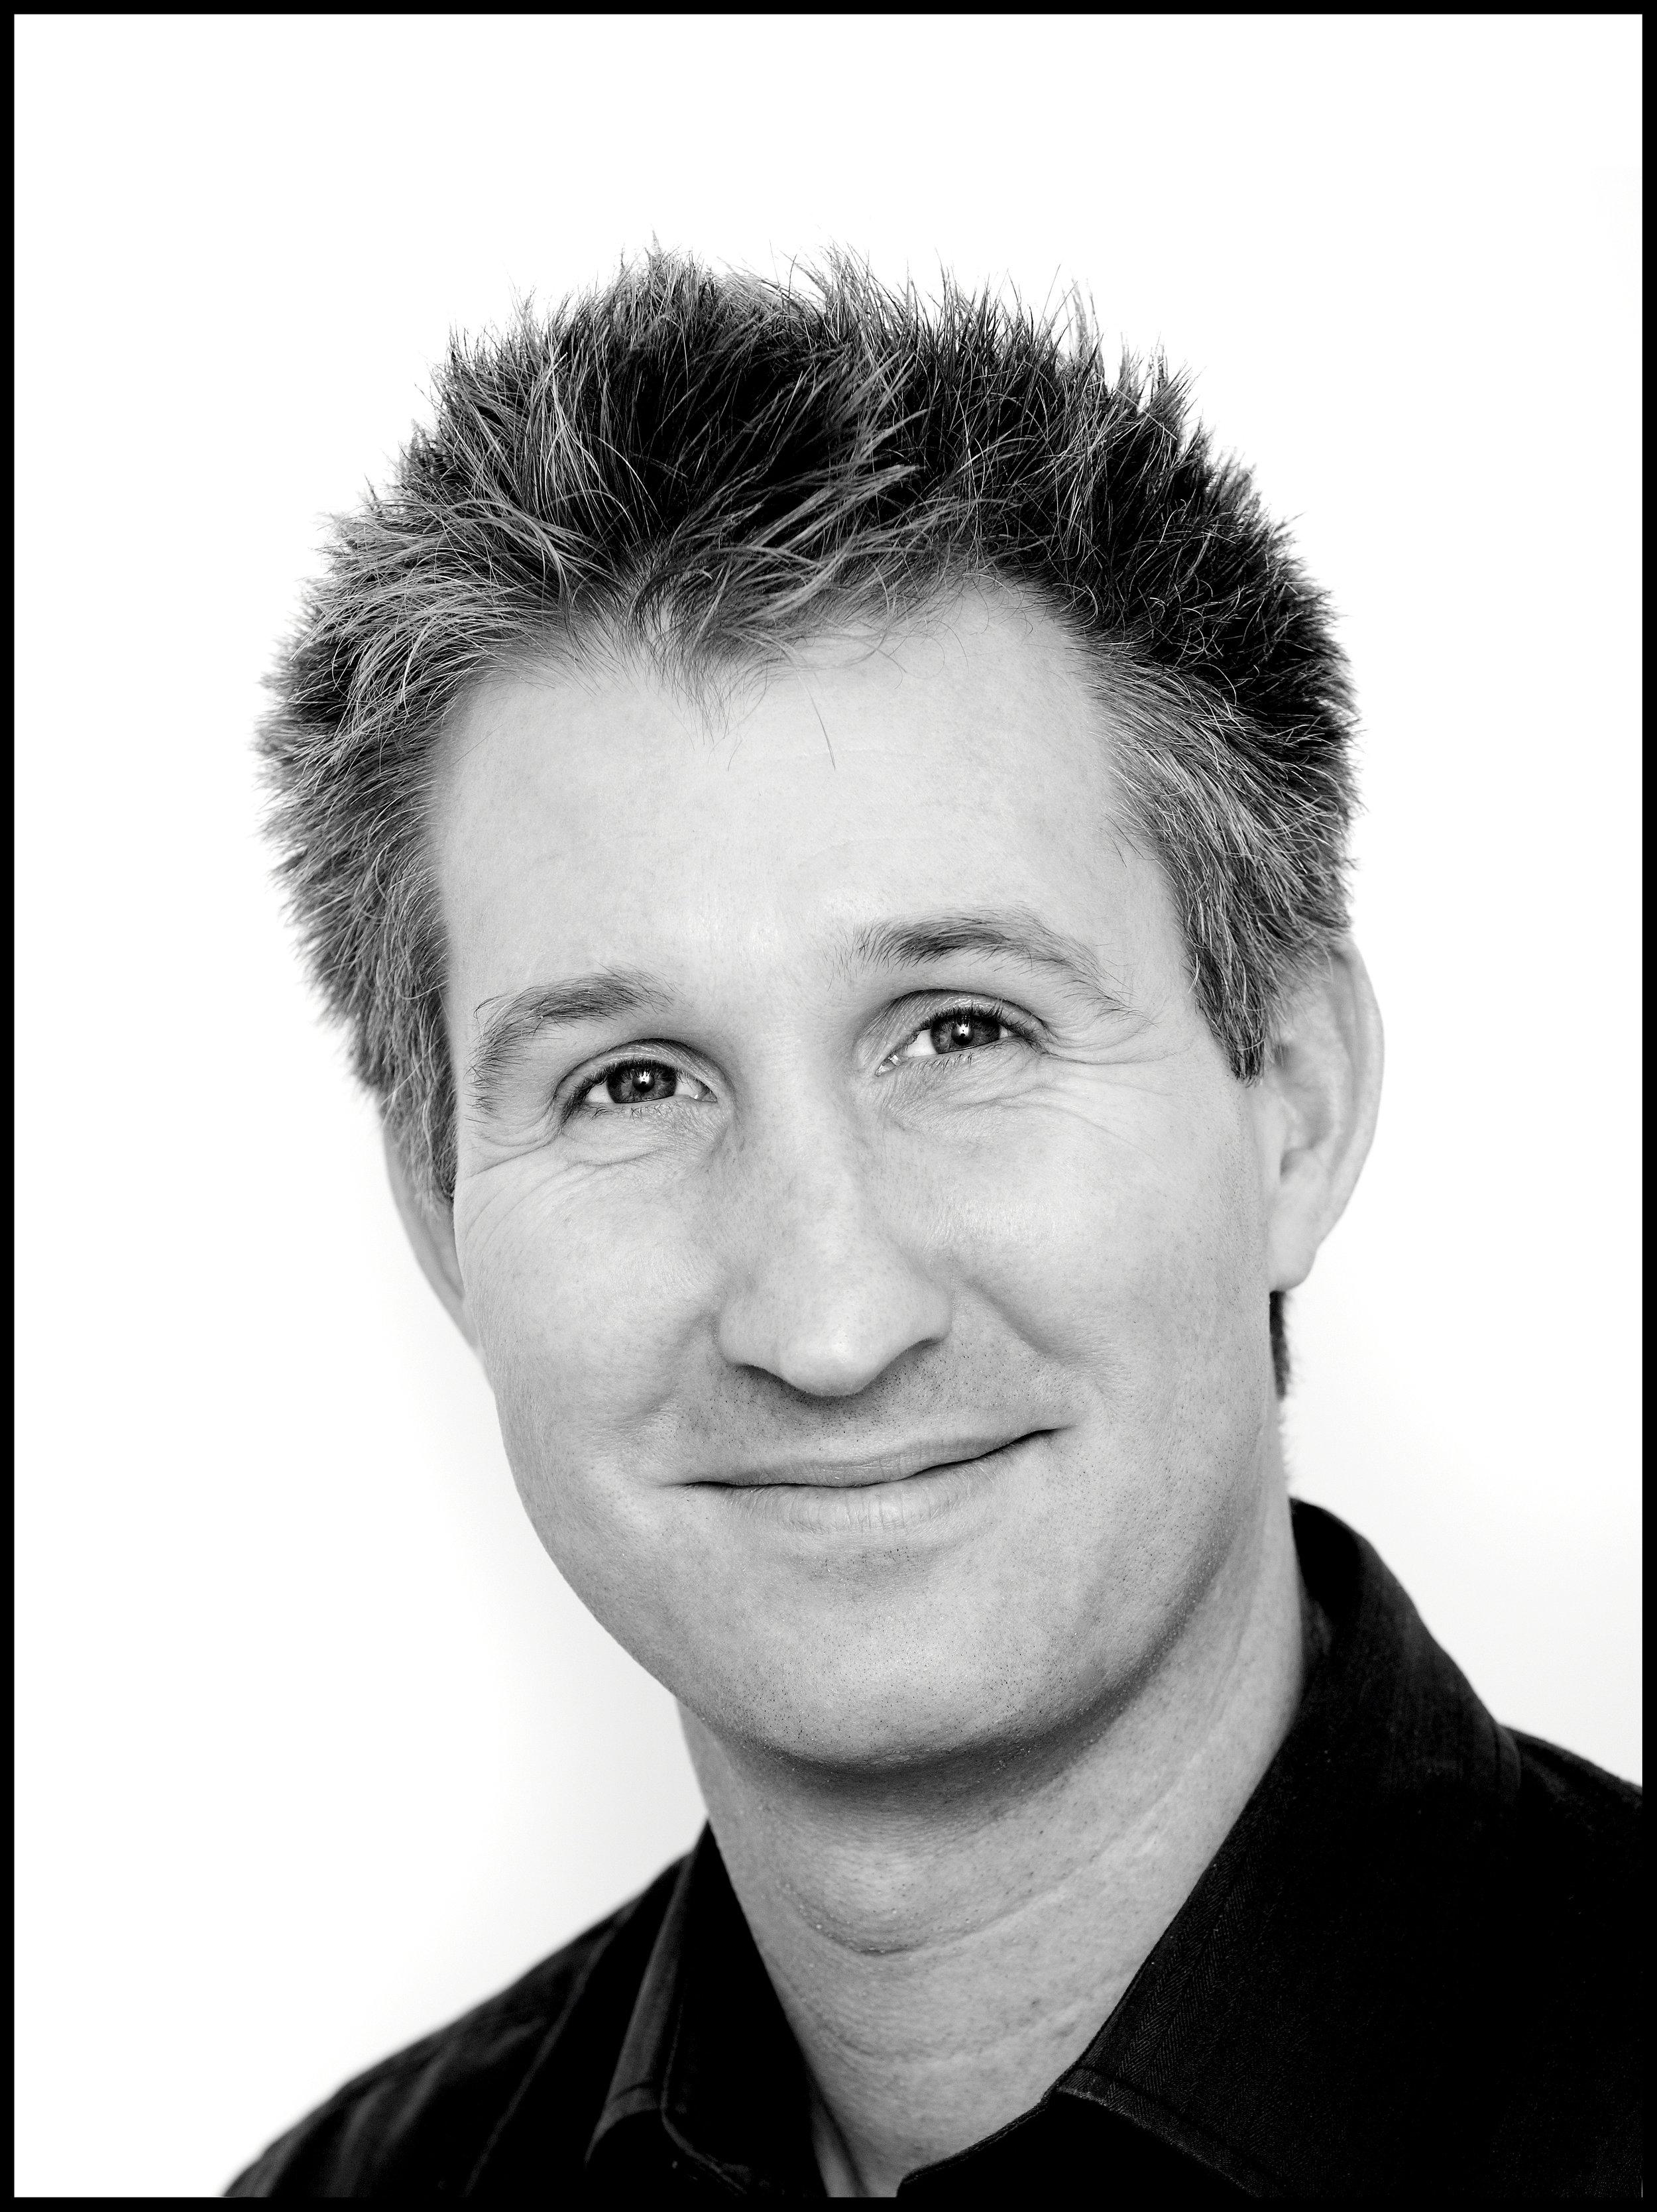 happy corporate man smiling portrait